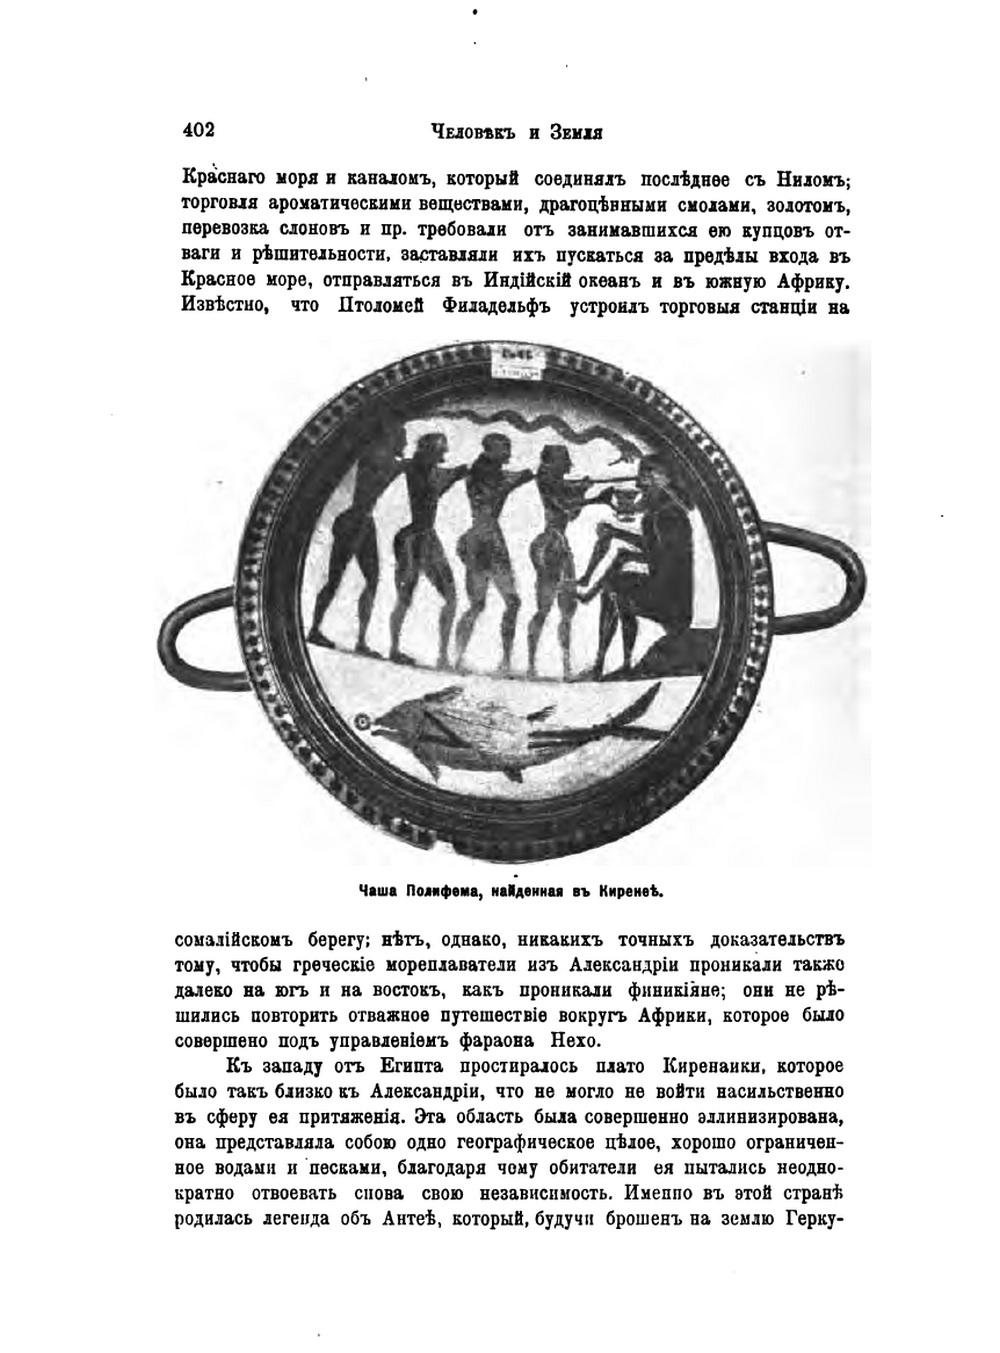 http://i5.imageban.ru/out/2013/11/19/ce759b27555479c471d70eda1f3f03d0.jpg